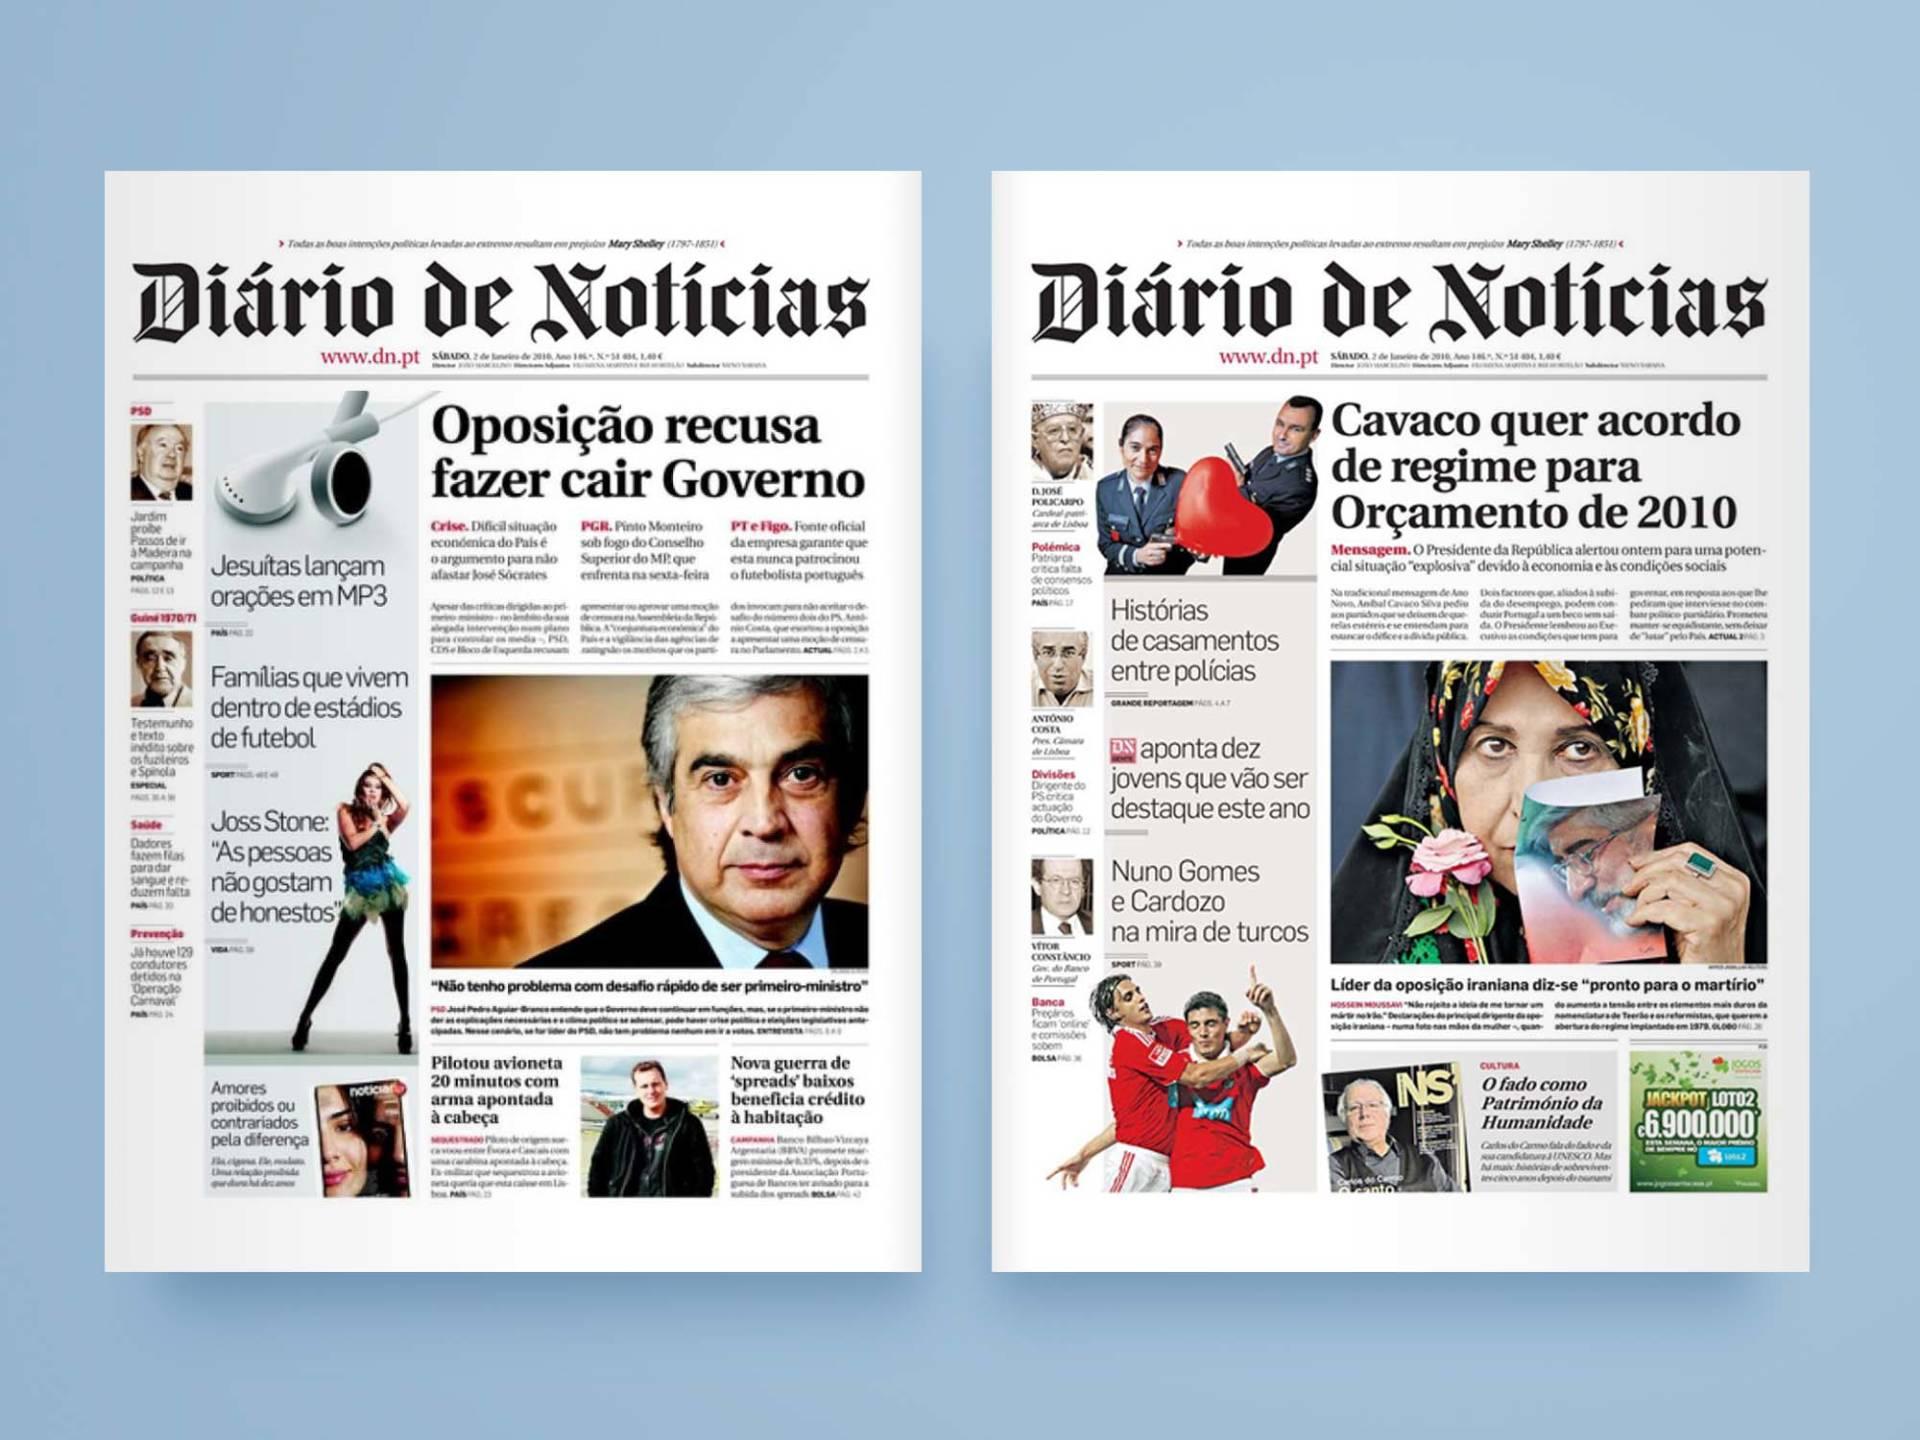 Diario_De_Noticias_08_Wenceslau_News_Design